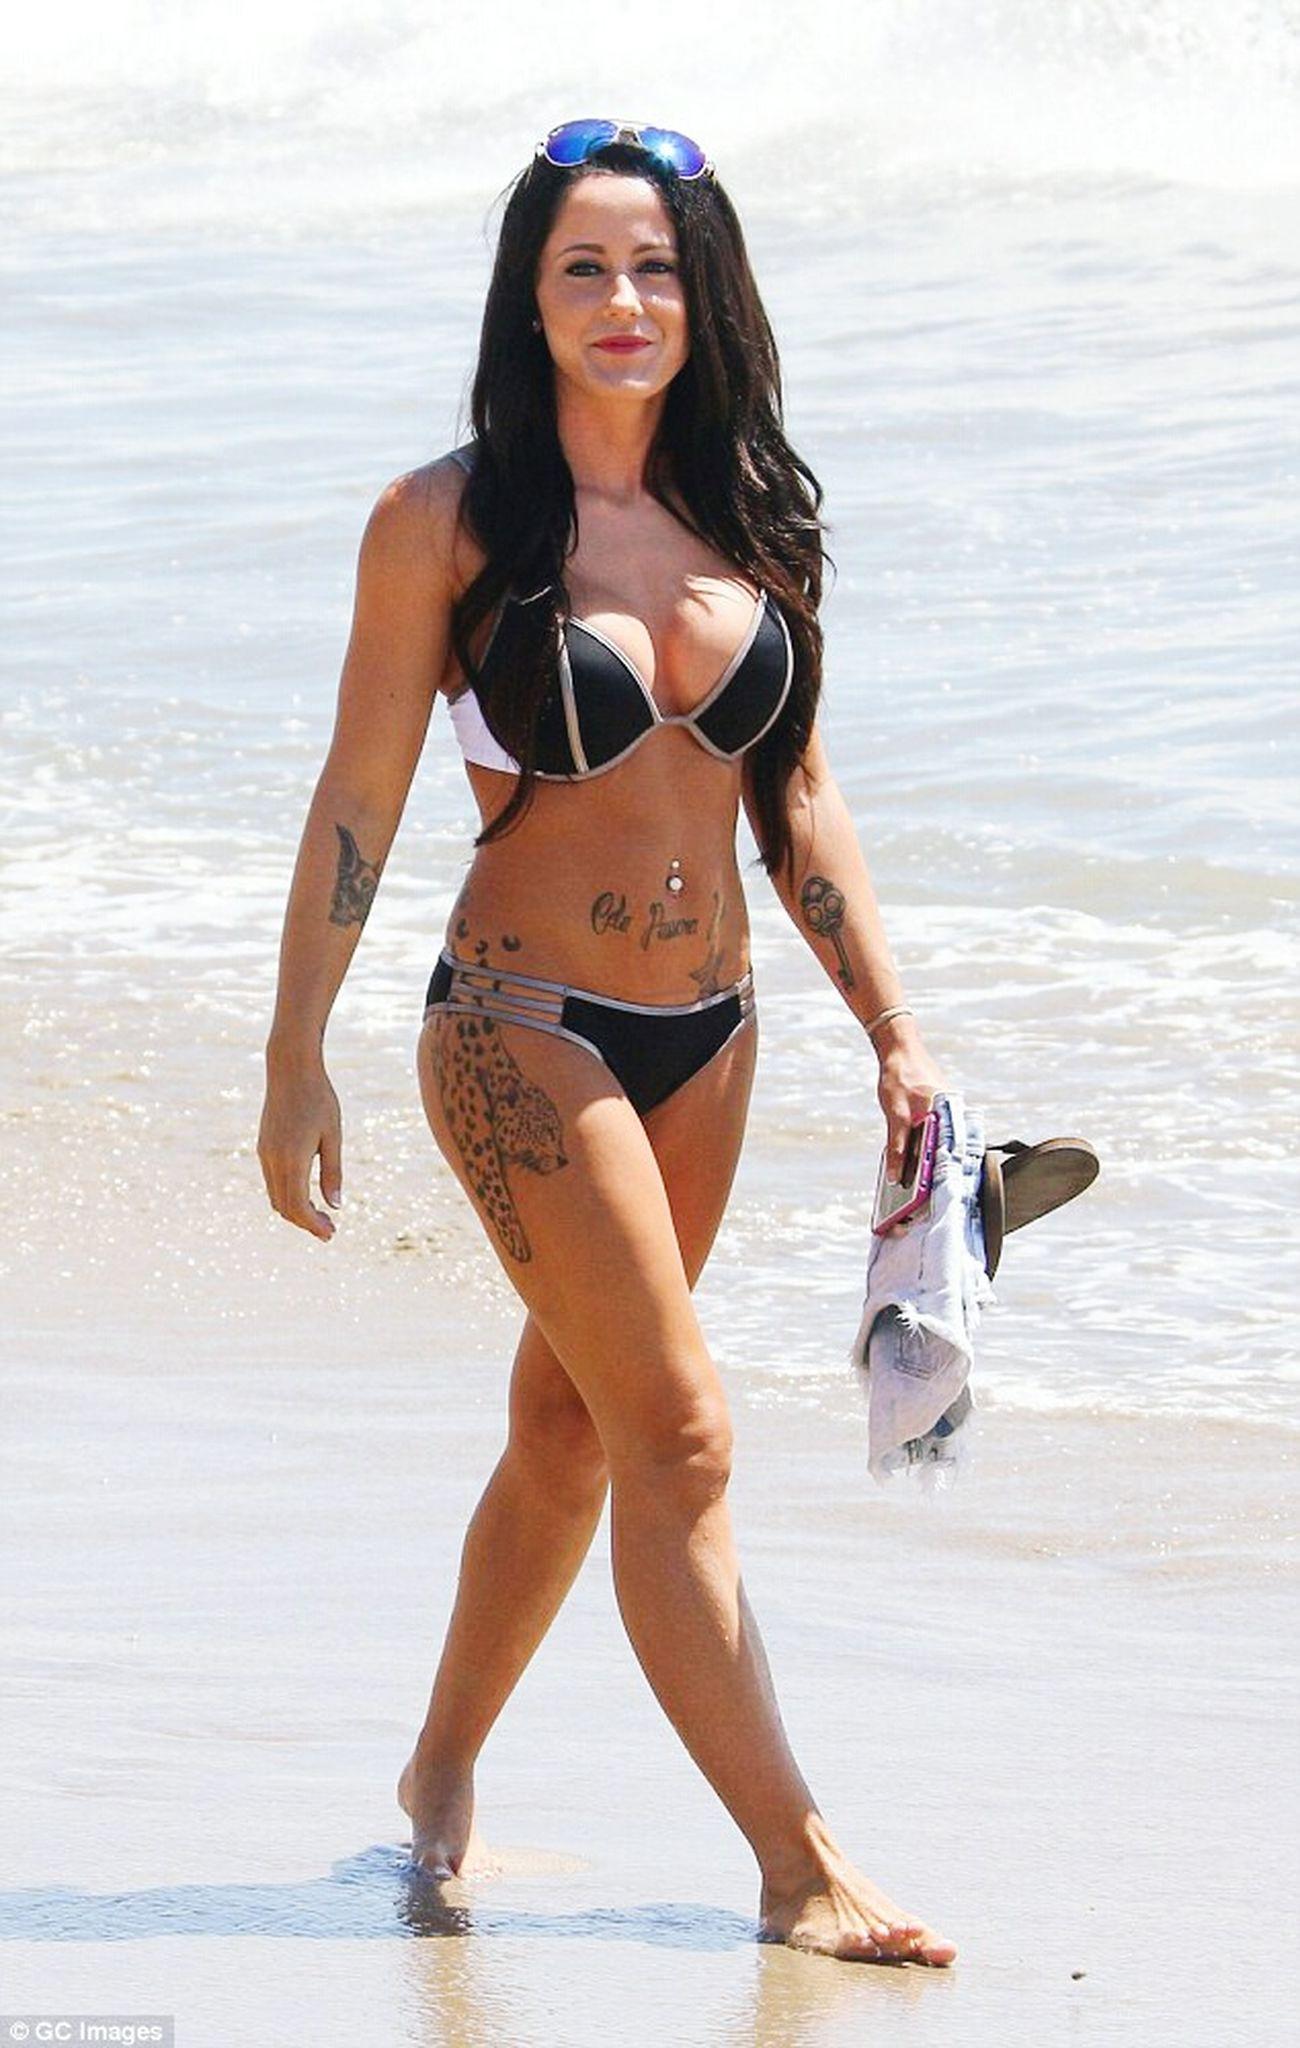 Crazygirl Beautiful Keep Smiling MyStar⭐ Mystars MyStar Tattoo Tattoos